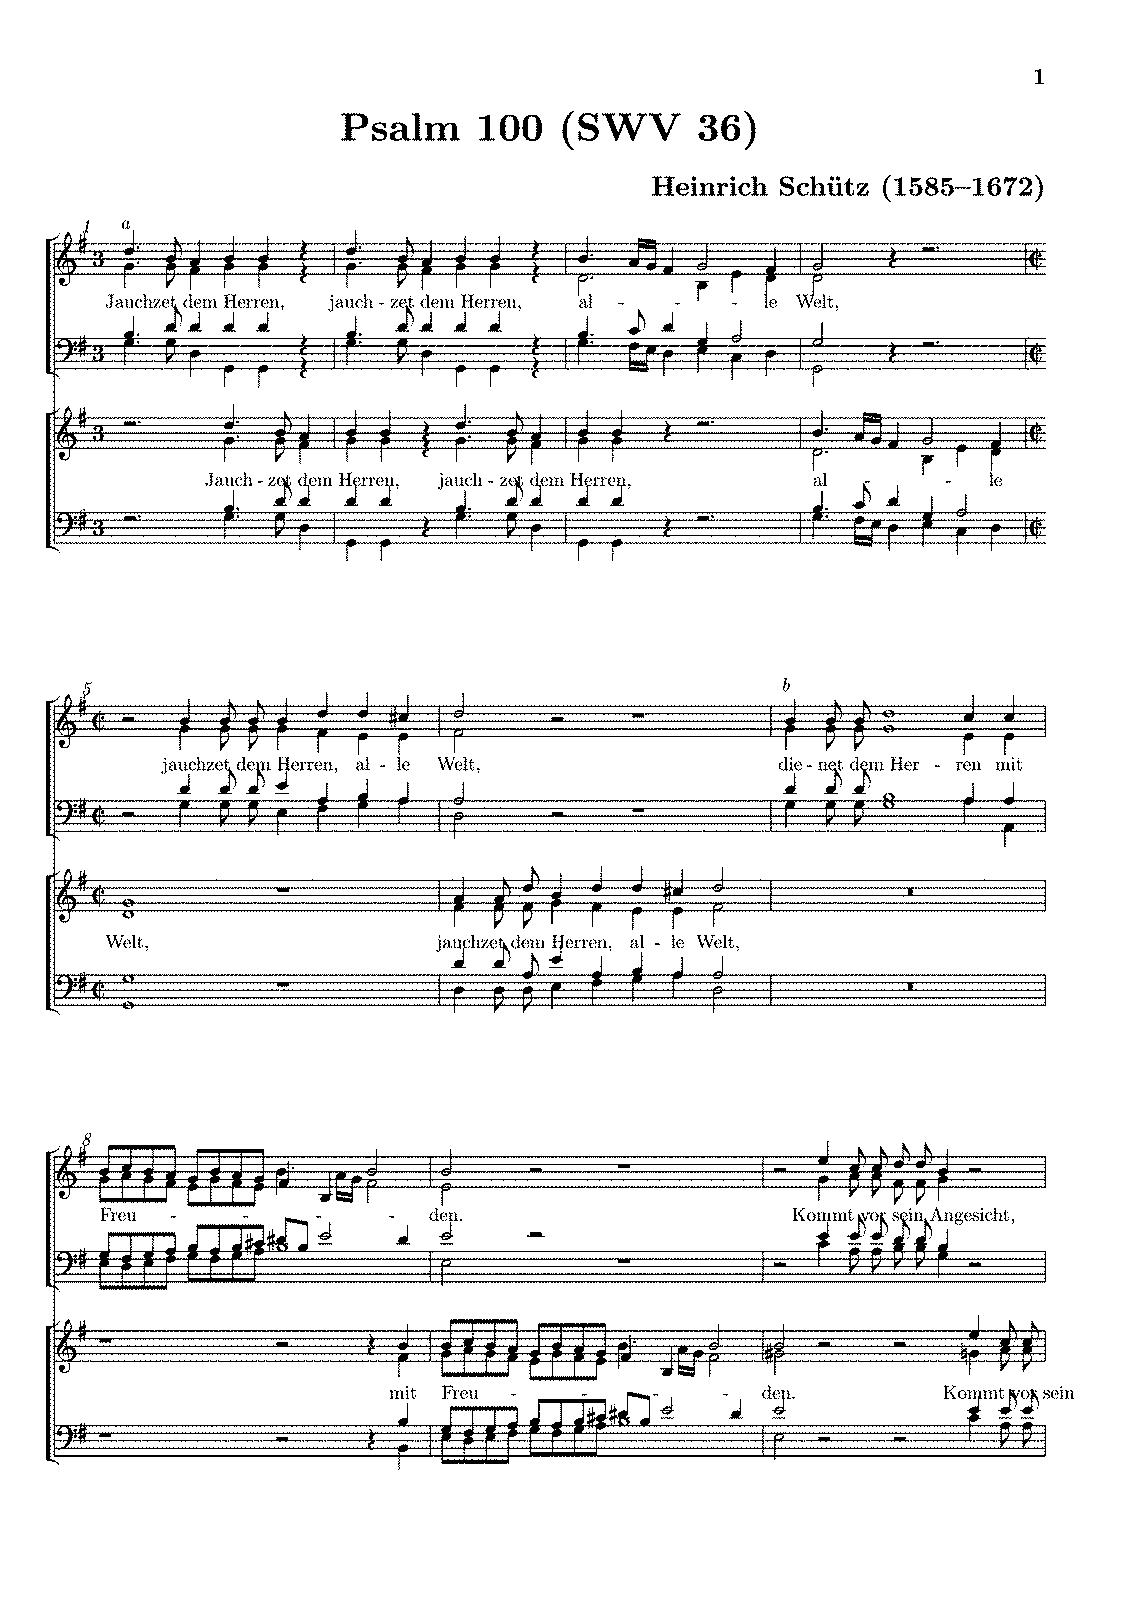 heinrich schütz psalmen